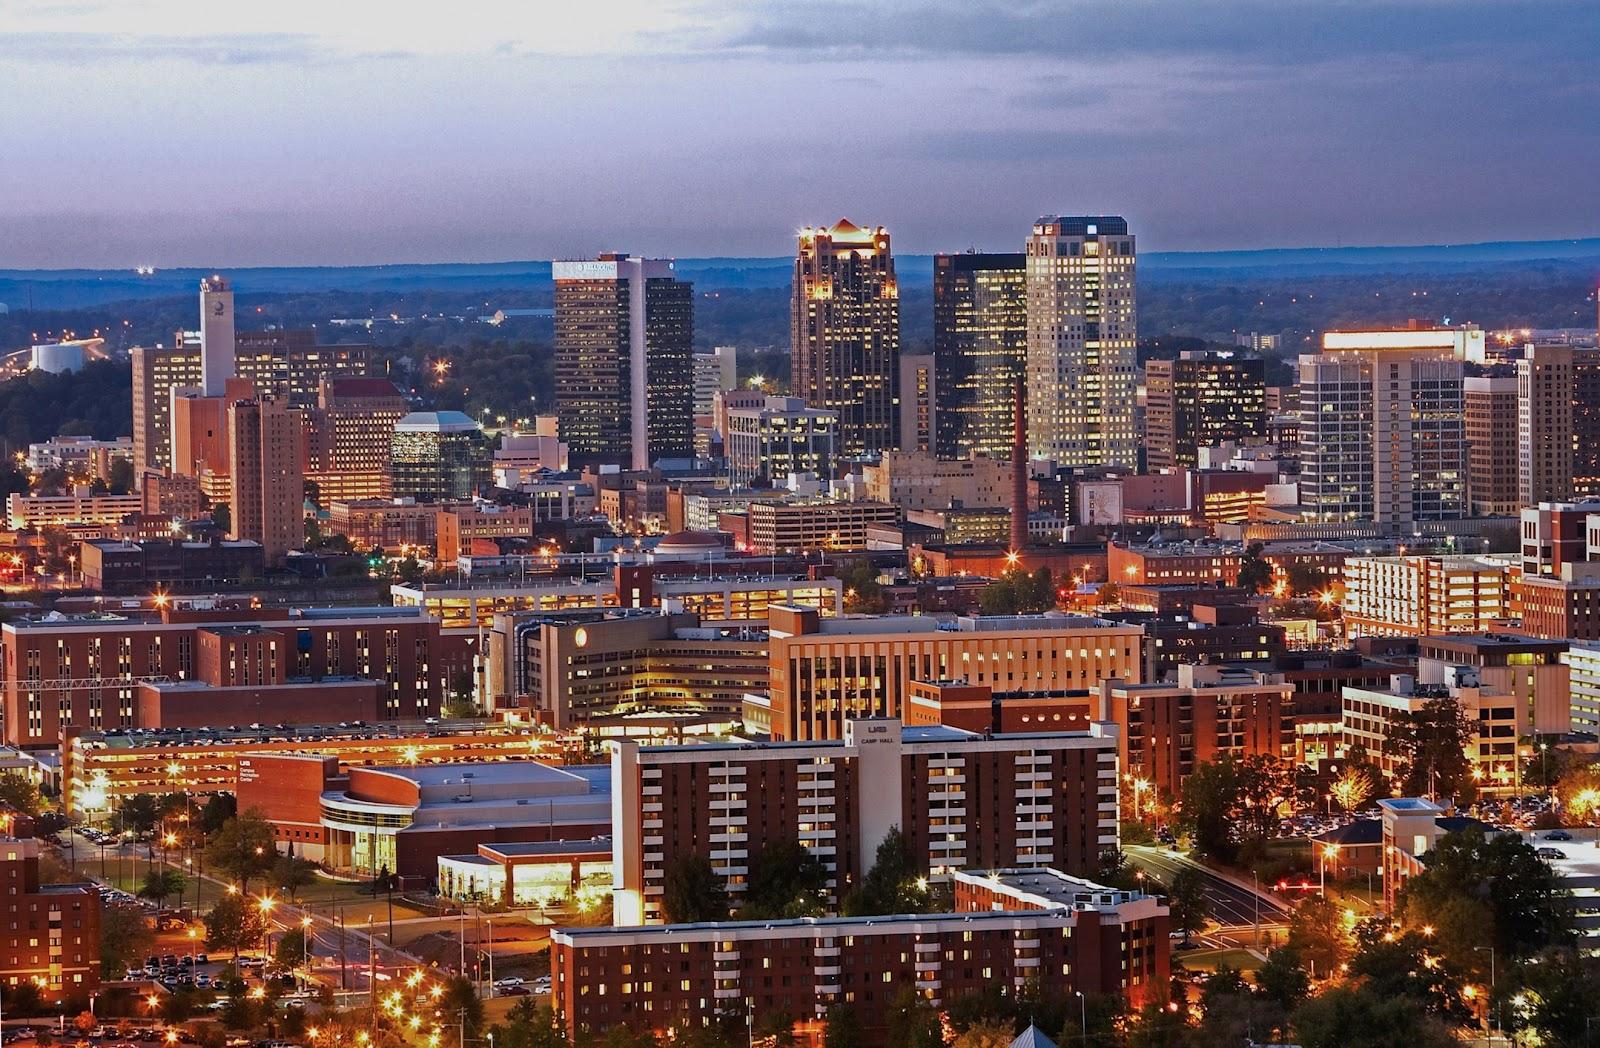 Travel & Adventures: Birmingham. A voyage to Birmingham